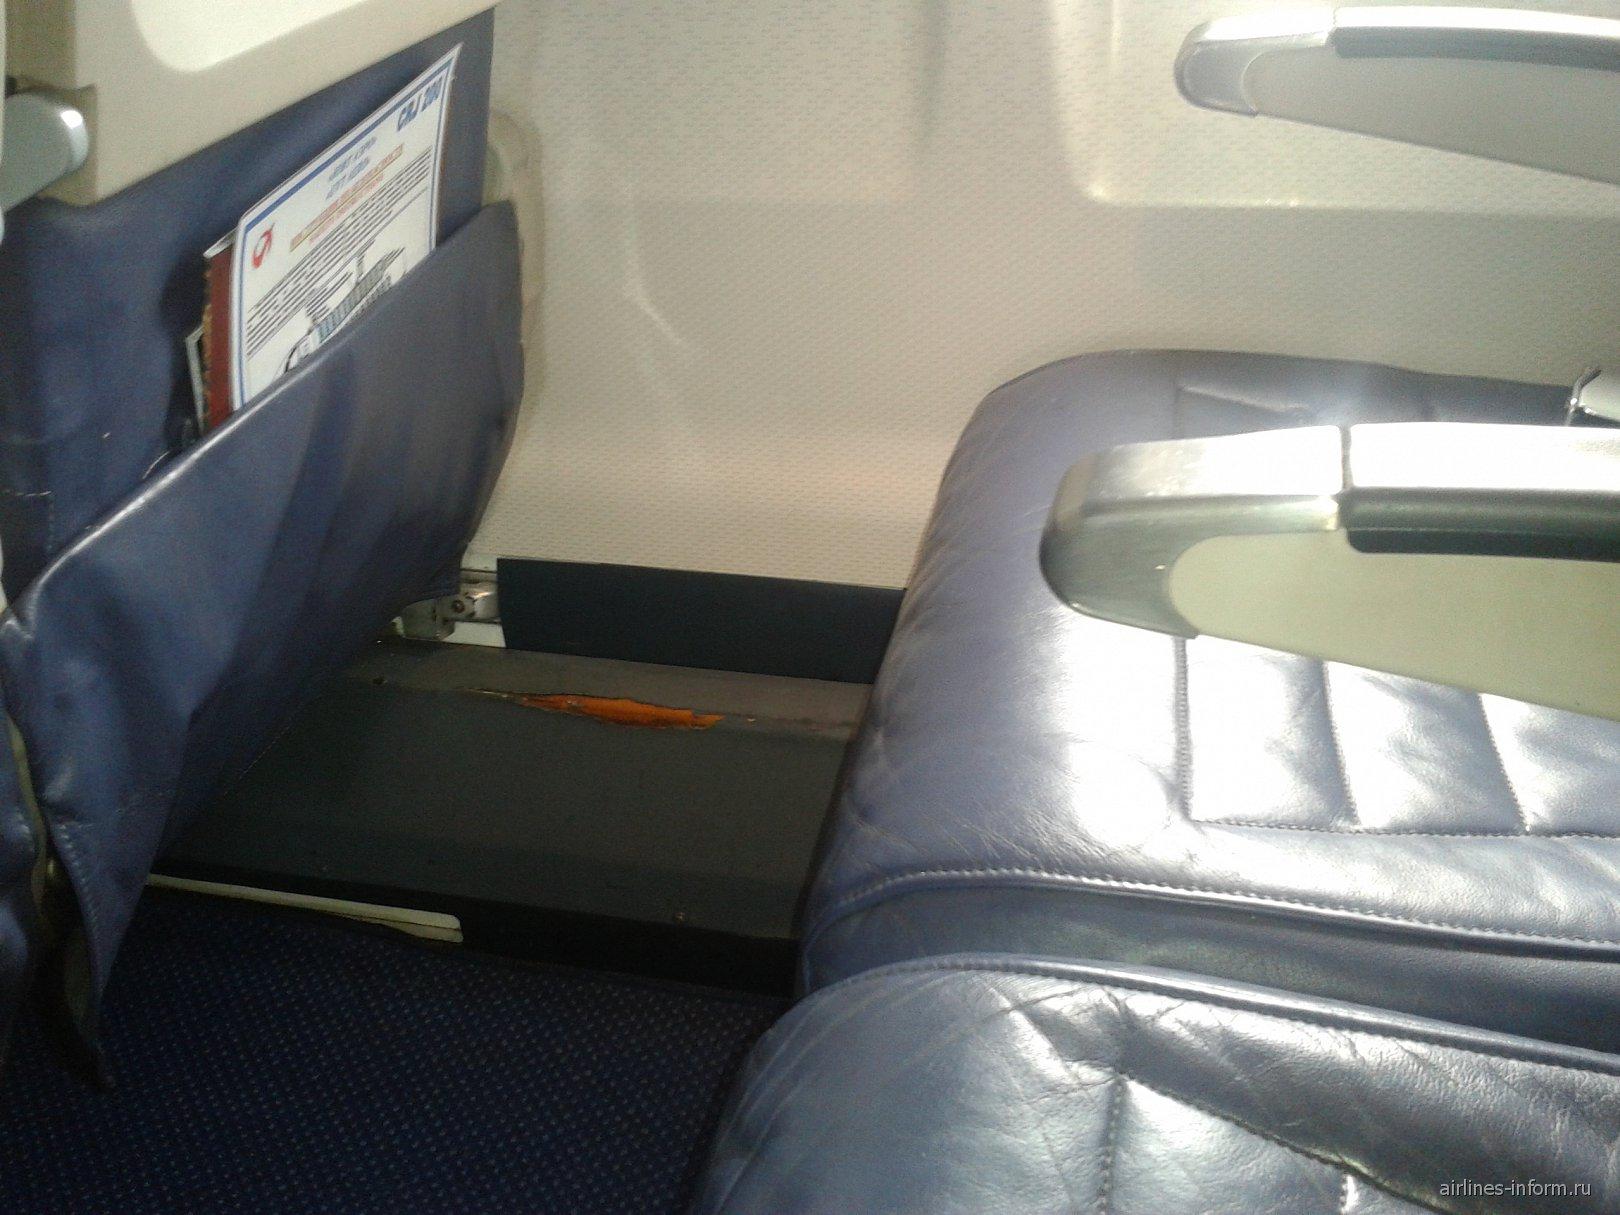 Кресла самолета Bombardier CRJ200 авиакомпании ЮВТ-аэро